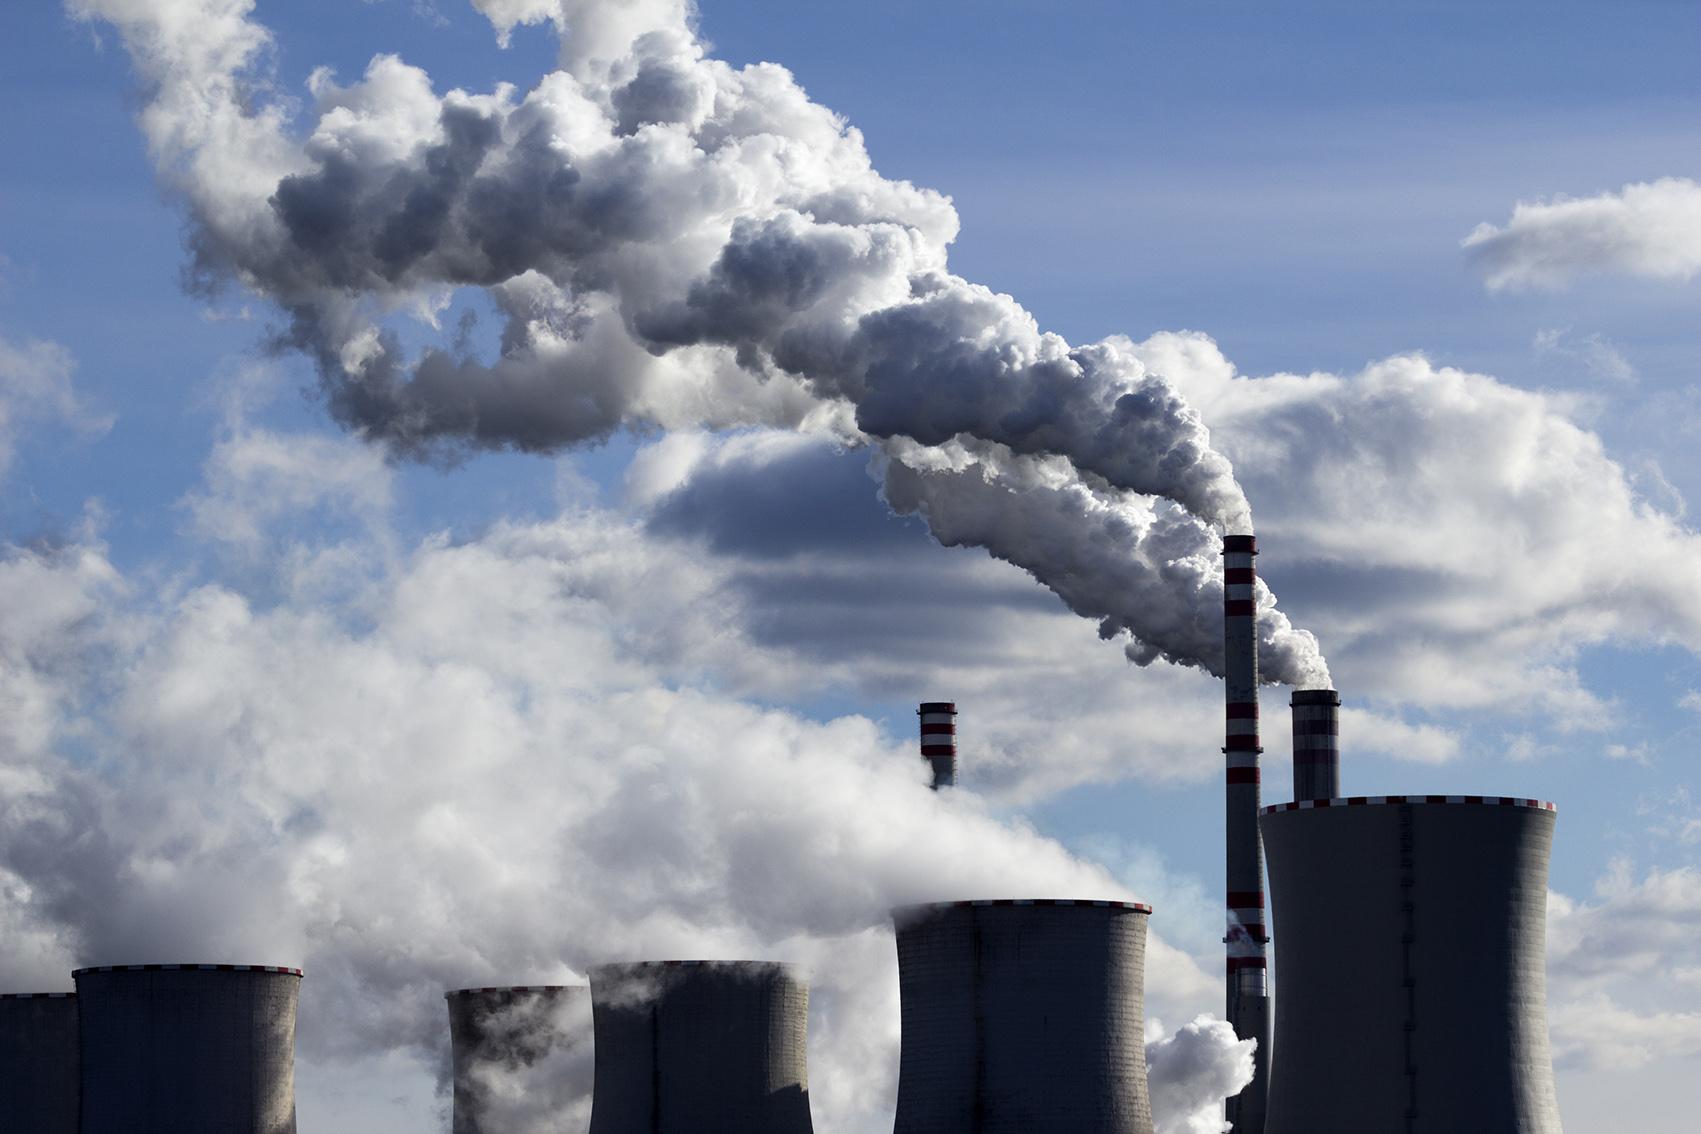 Coal Power Plant Project Runs Into Controversy